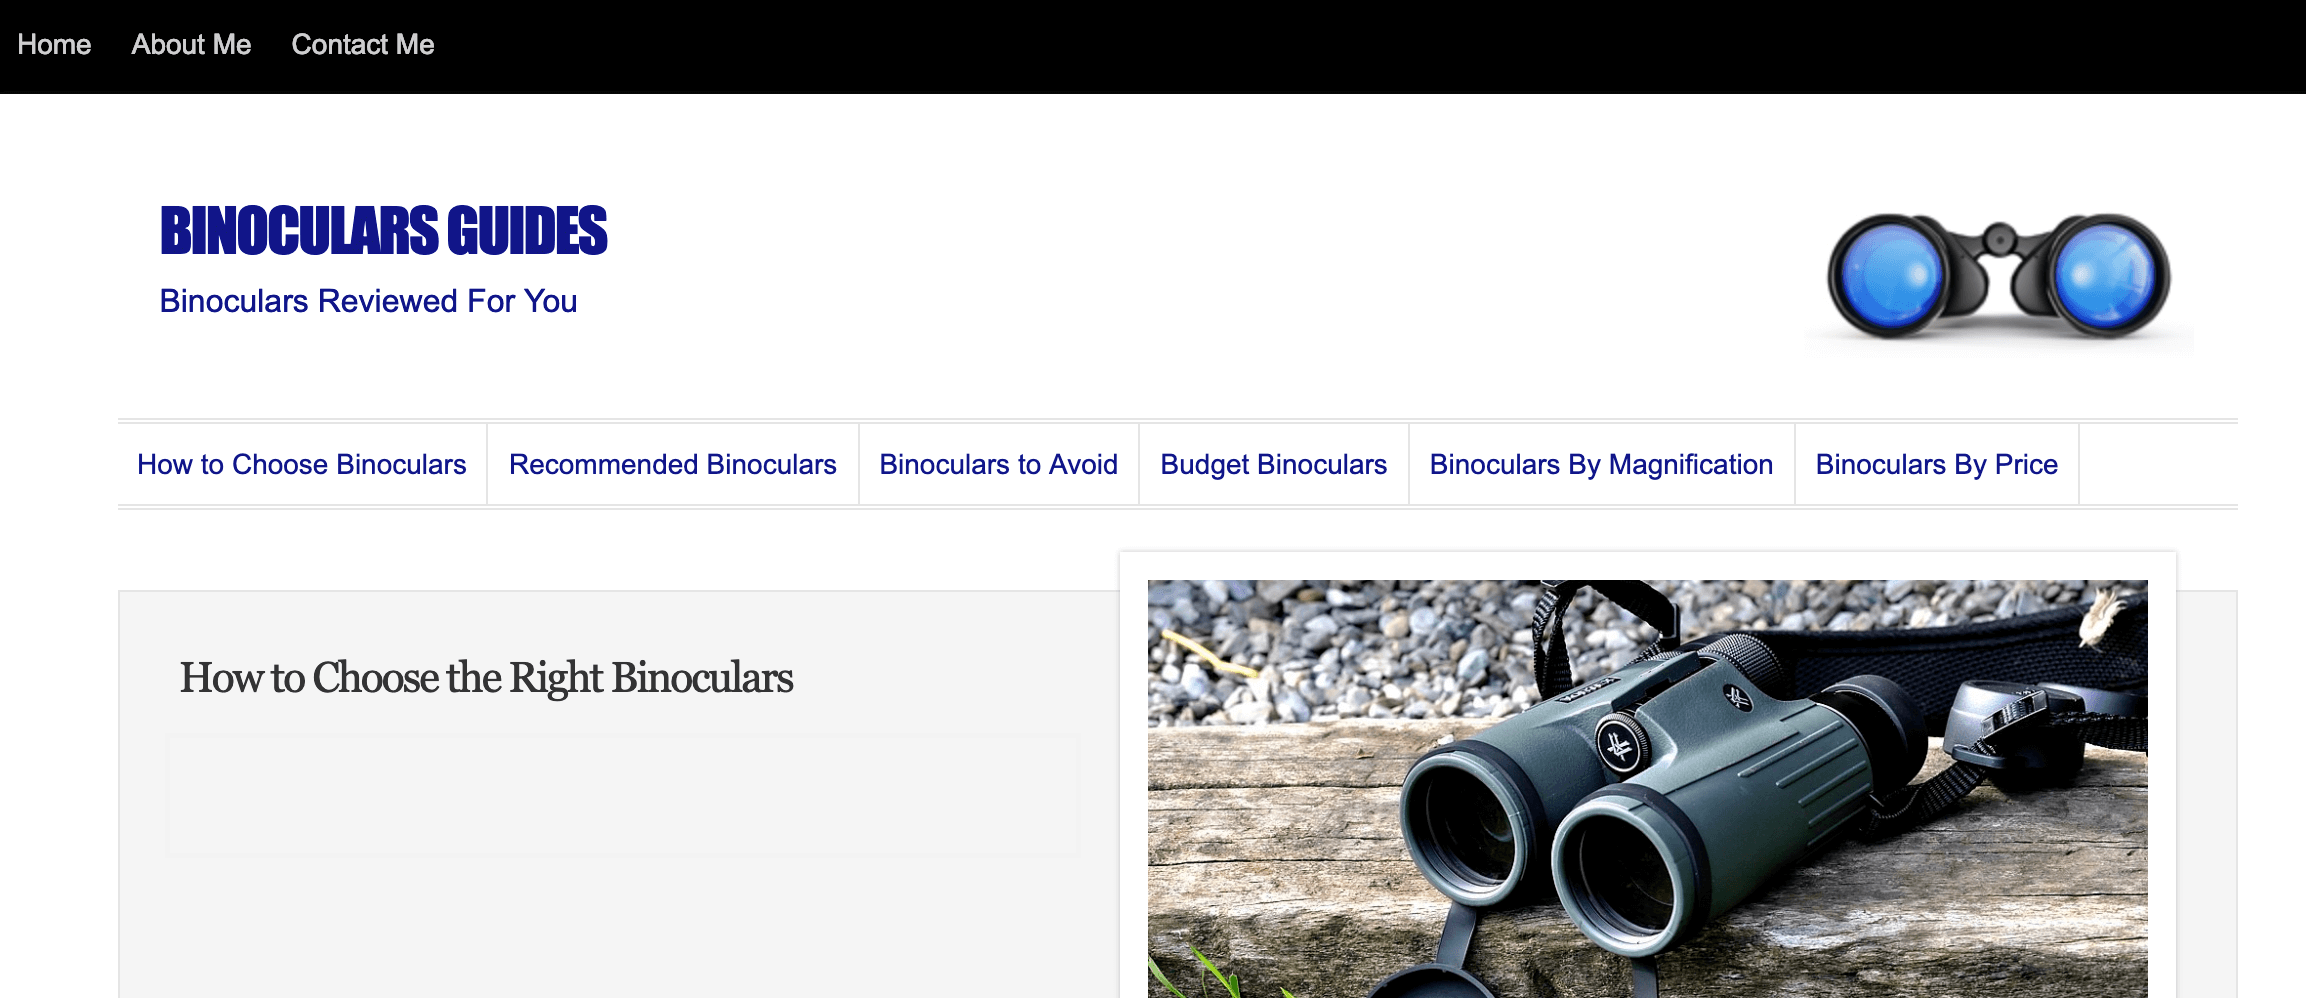 binoculars-guides-service